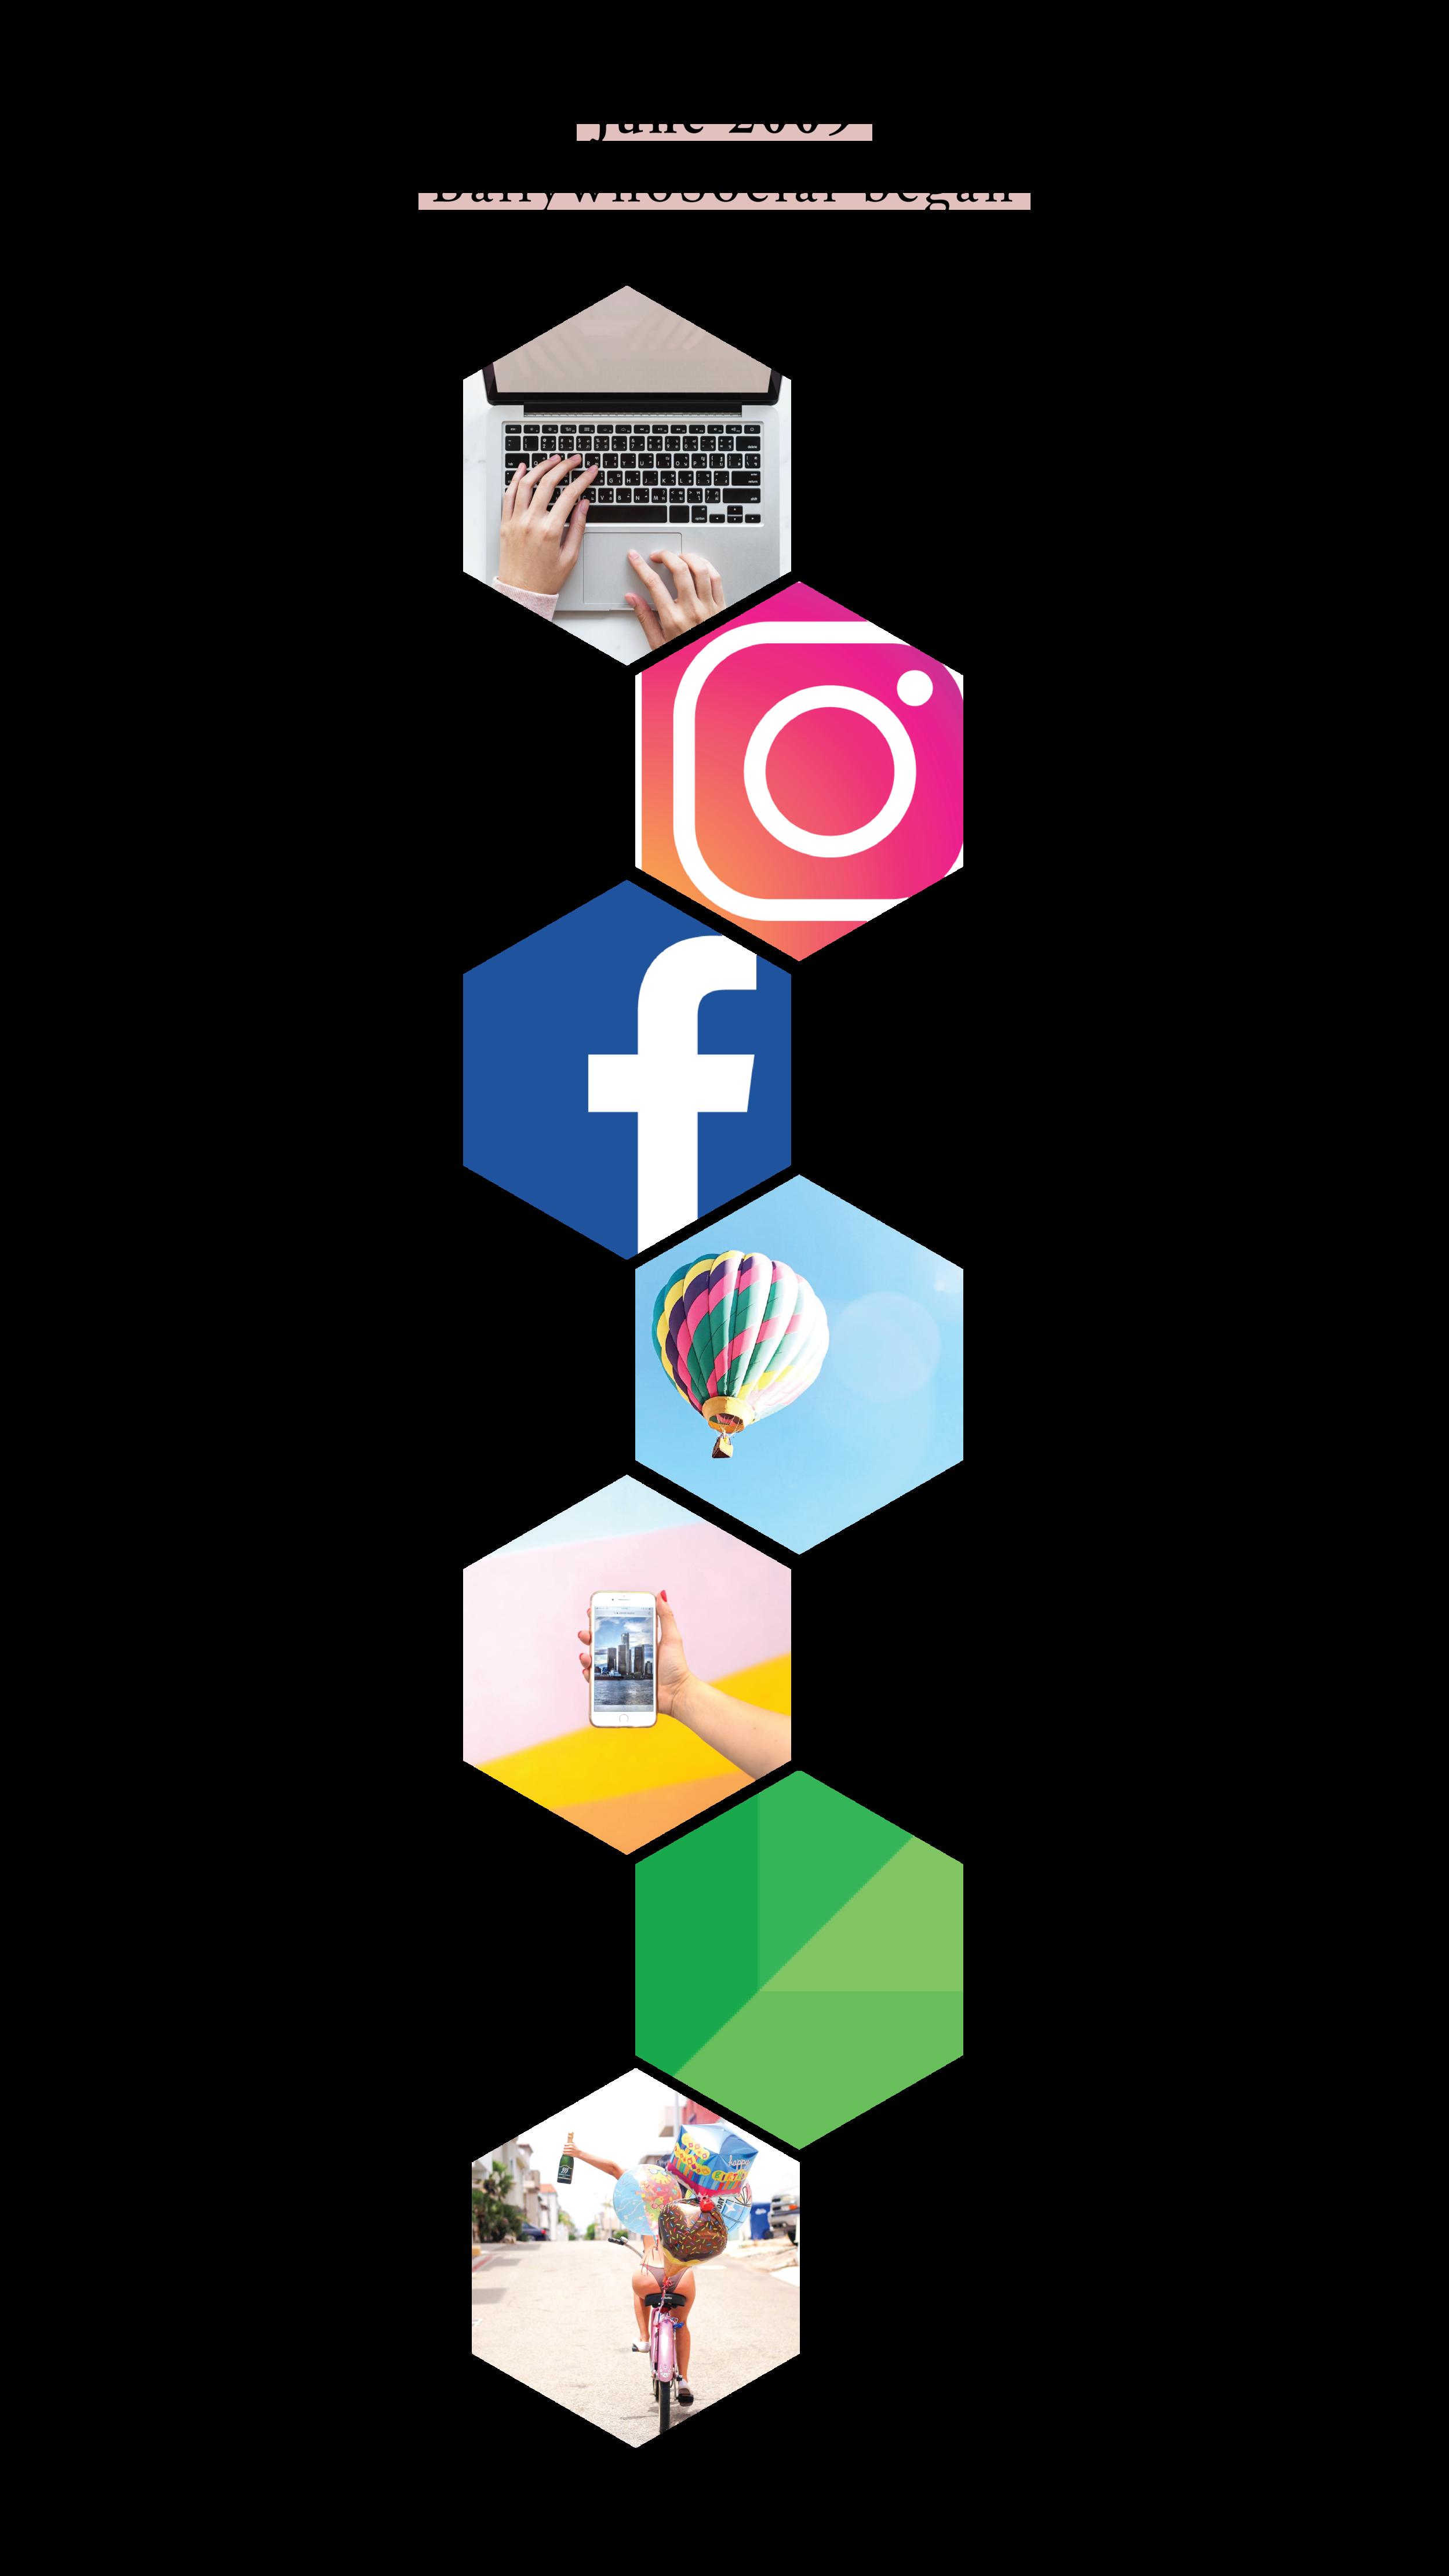 Ballywho-timeline-social-media-management-florida-charleston-instagram-facebook-history-linkedin